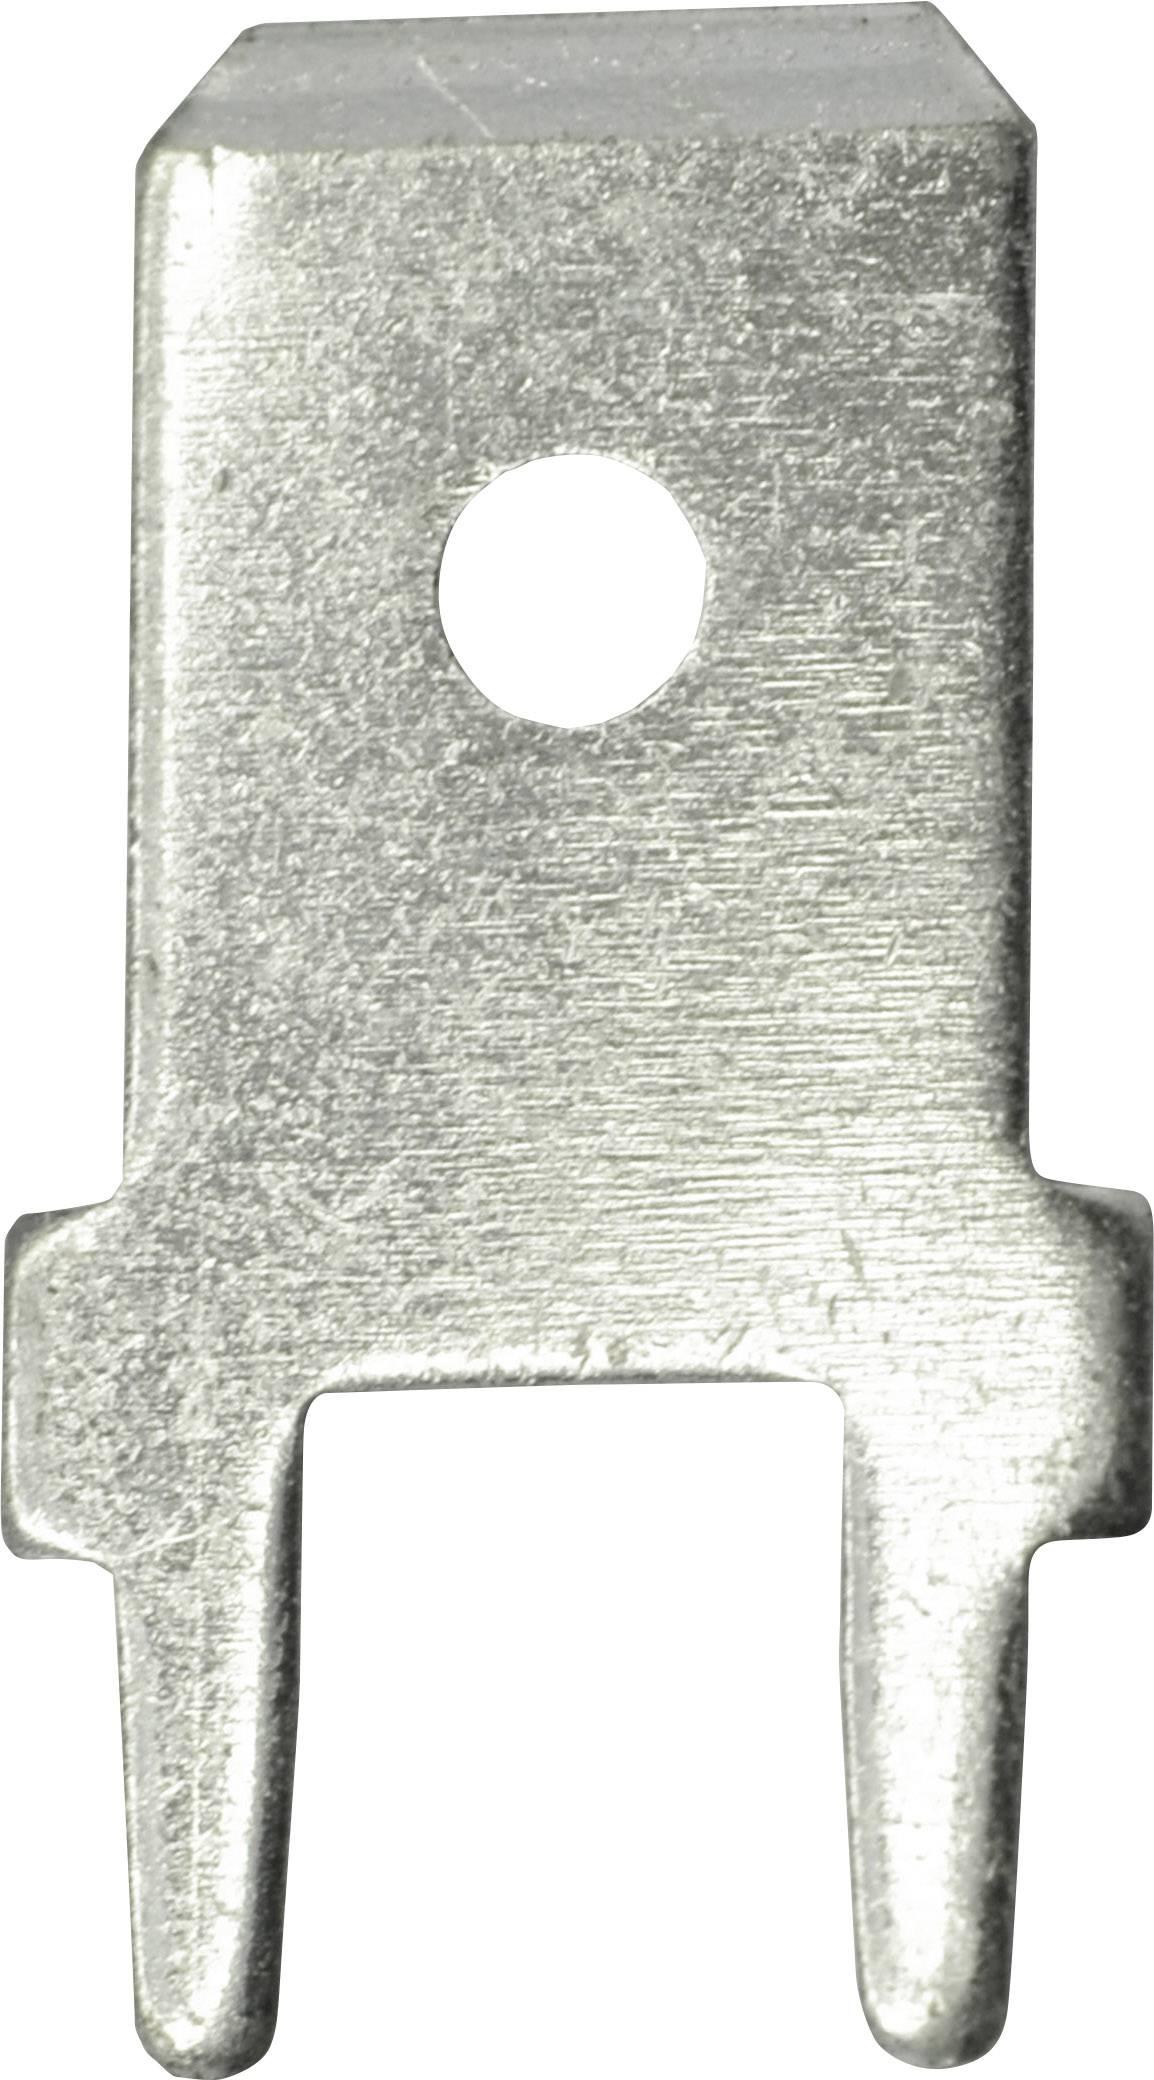 Faston zástrčka Vogt Verbindungstechnik 3866b.68 6.3 mm x 180 °, bez izolace, kov, 100 ks